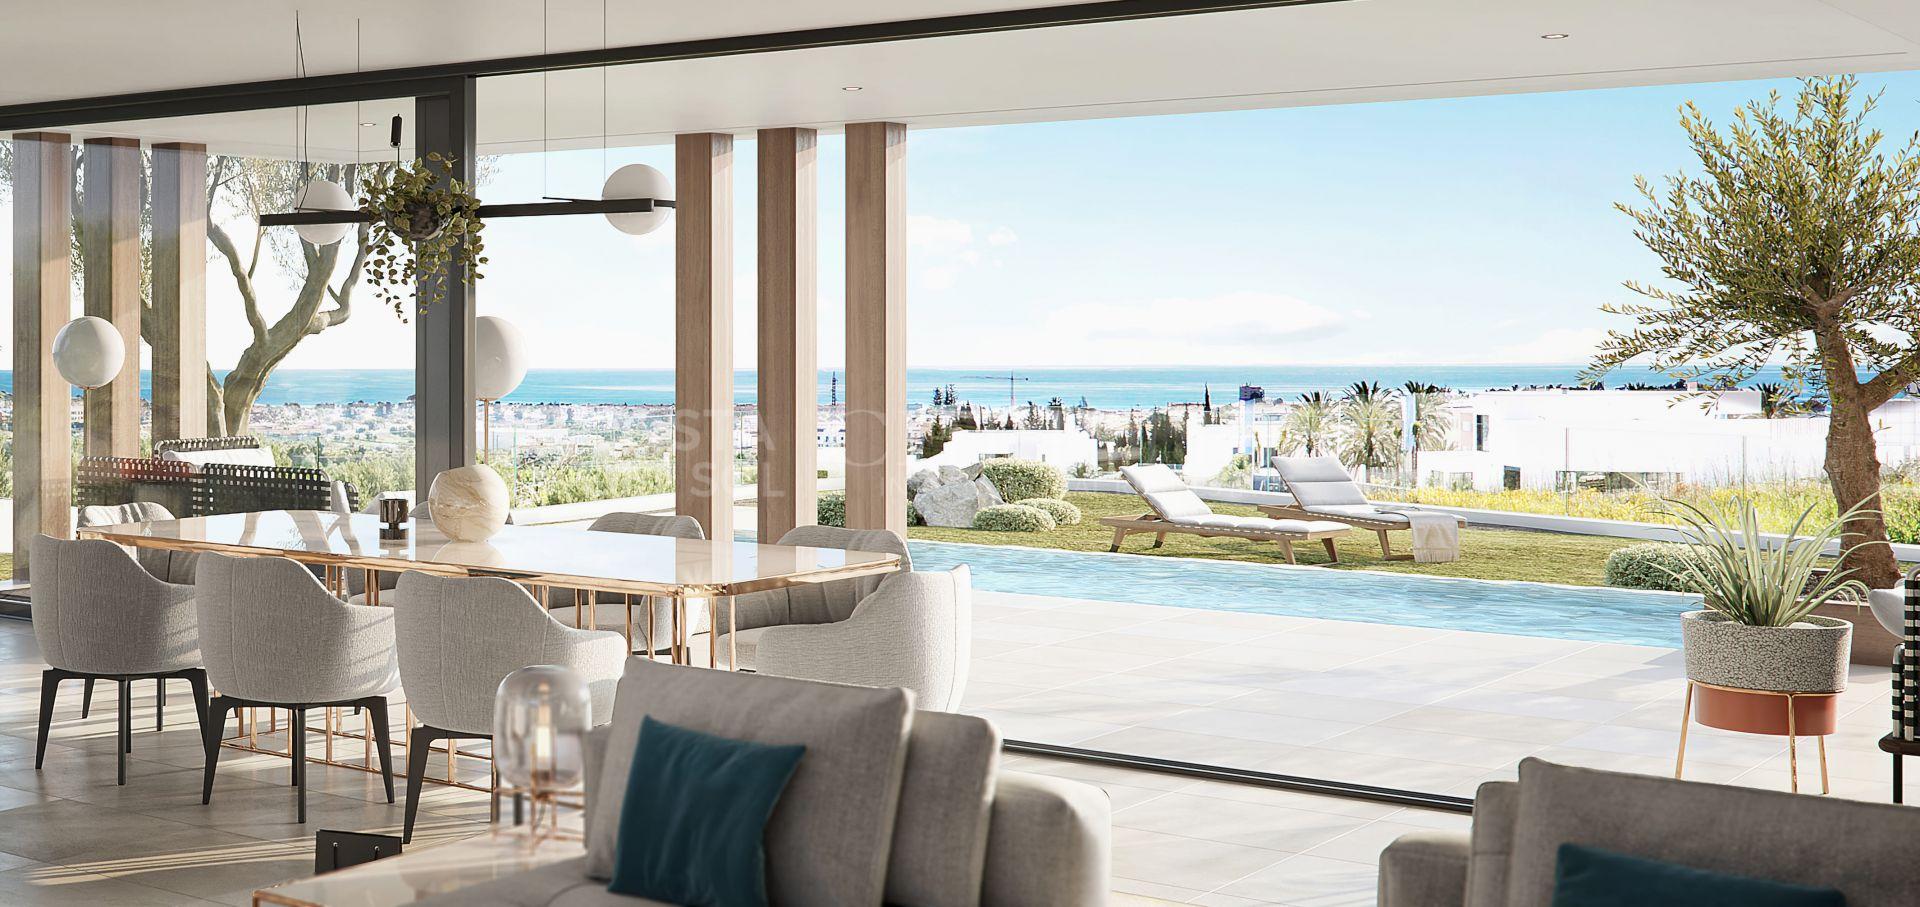 Elegant Villa Silk, New Golden Mile, Estepona   Christie's International Real Estate